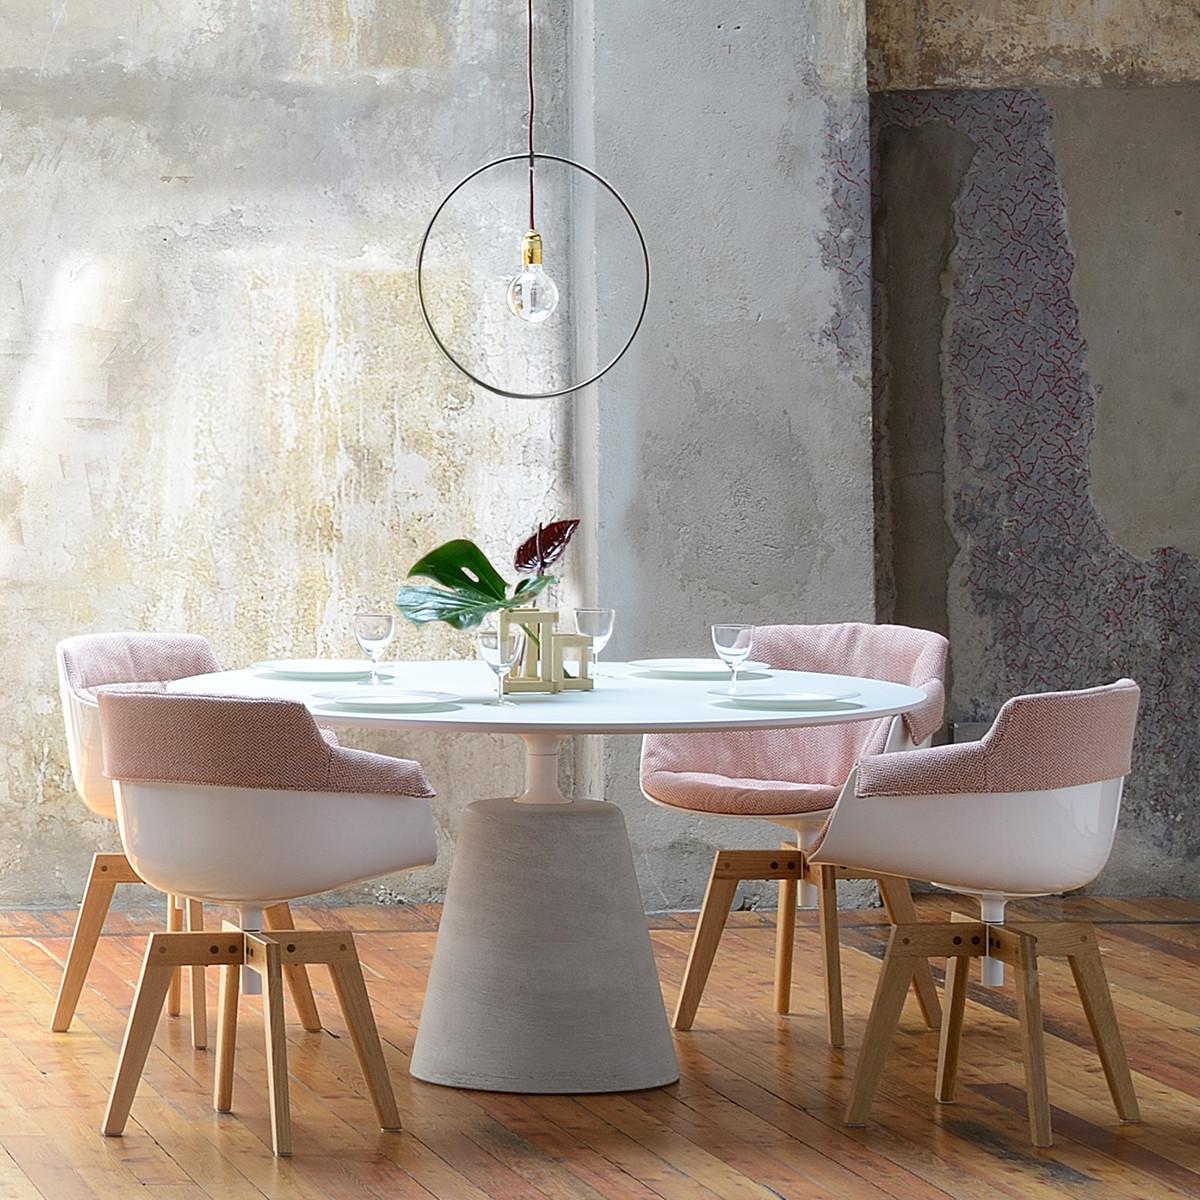 mdf italia rock table tisch 140 cm holzplatte casa de. Black Bedroom Furniture Sets. Home Design Ideas